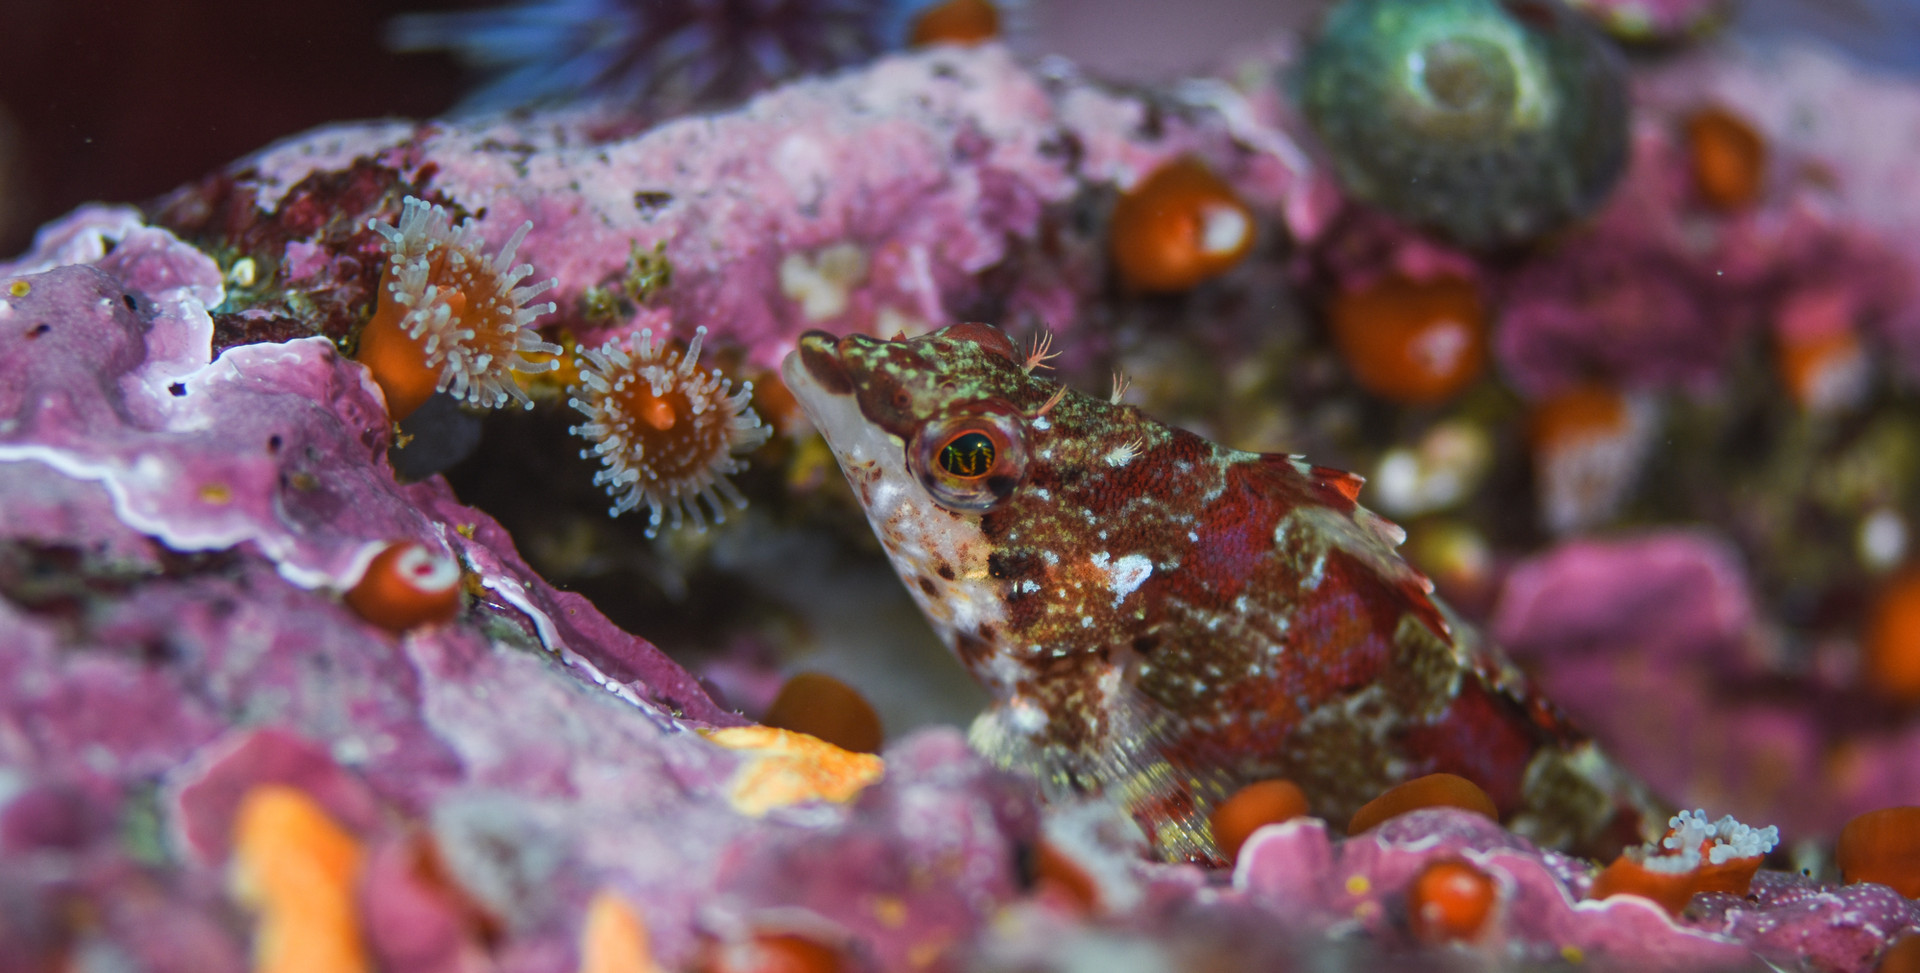 Fish-KelpForest-1.jpg